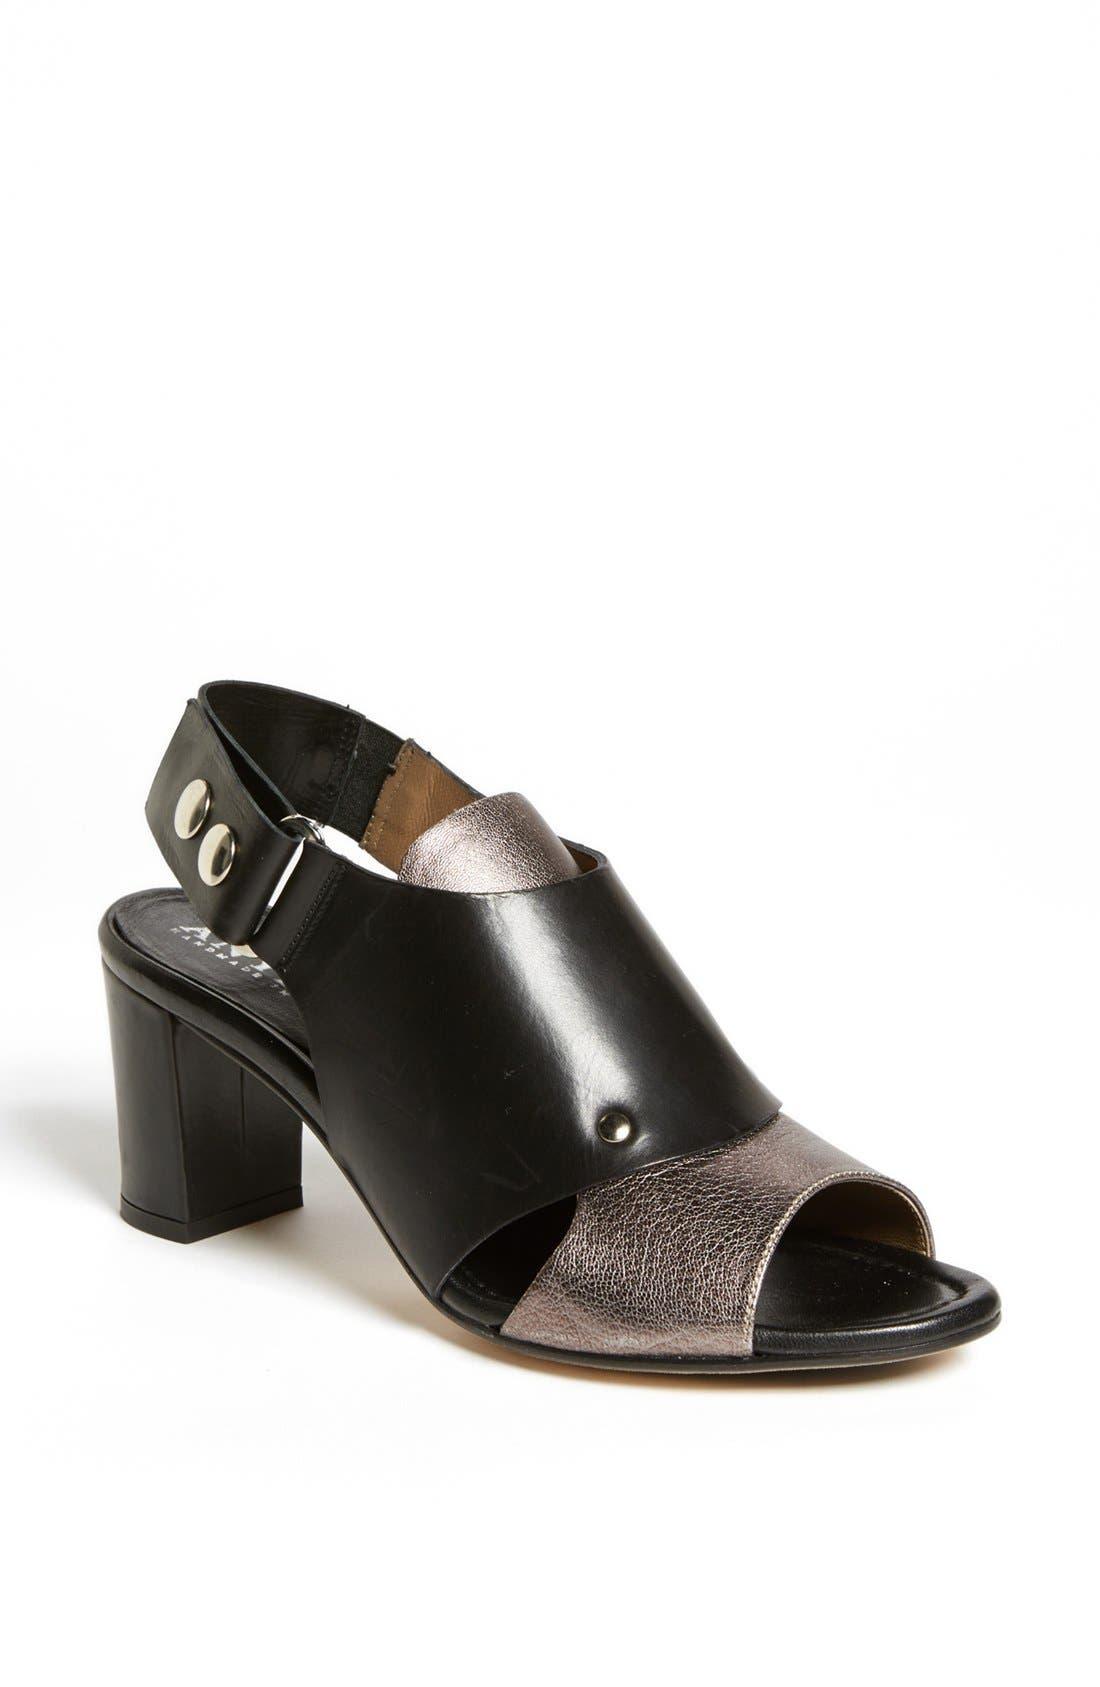 Alternate Image 1 Selected - Anyi Lu 'Athena' Sandal